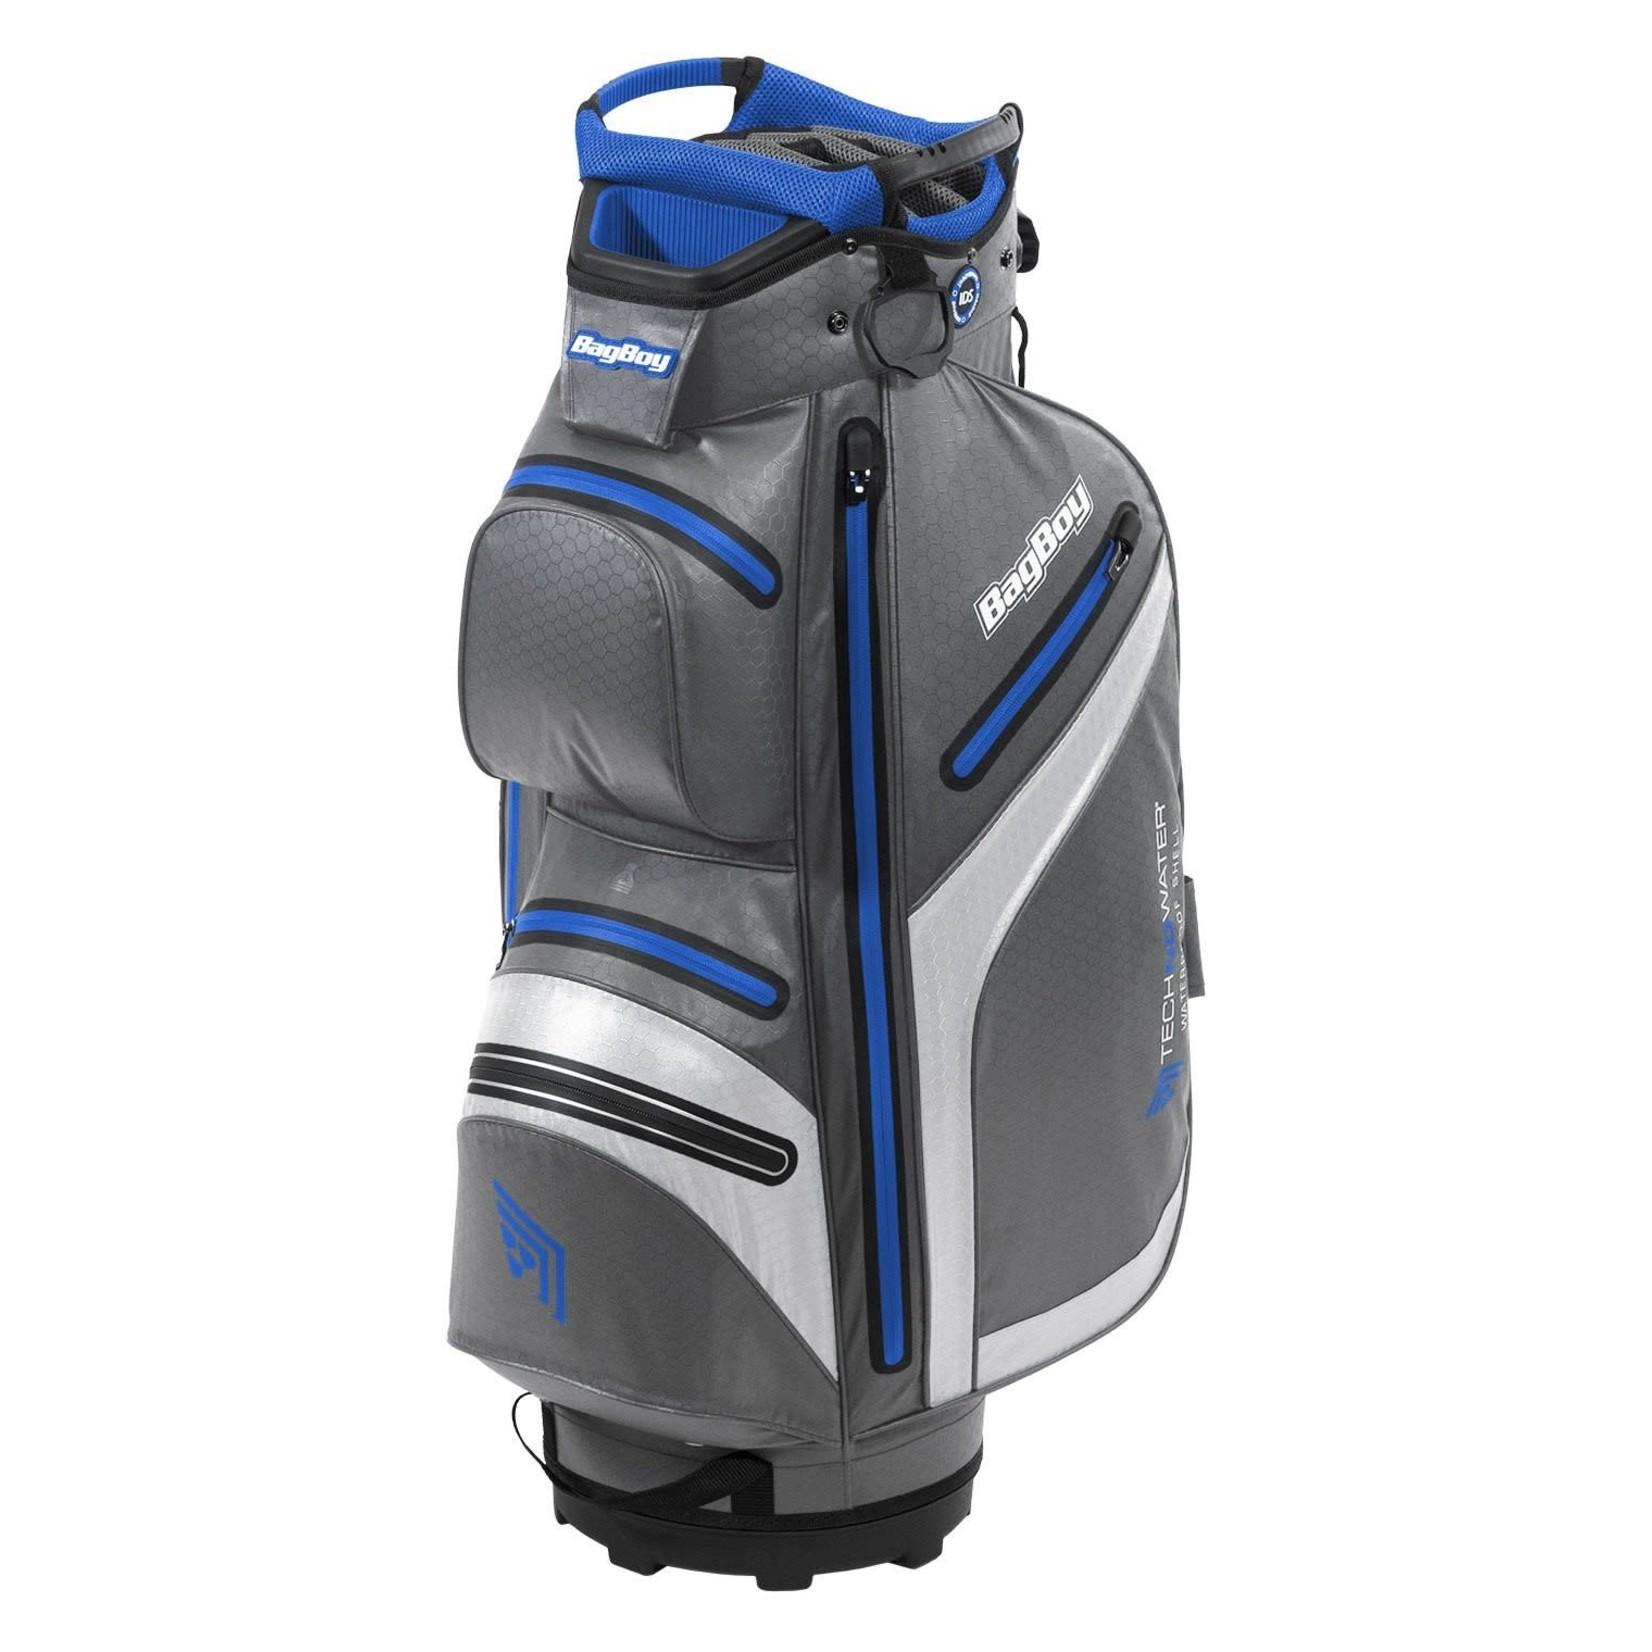 BagBoy BagBoy DG Lite DRI TL Cartbag Charcoal/White/Cobalt